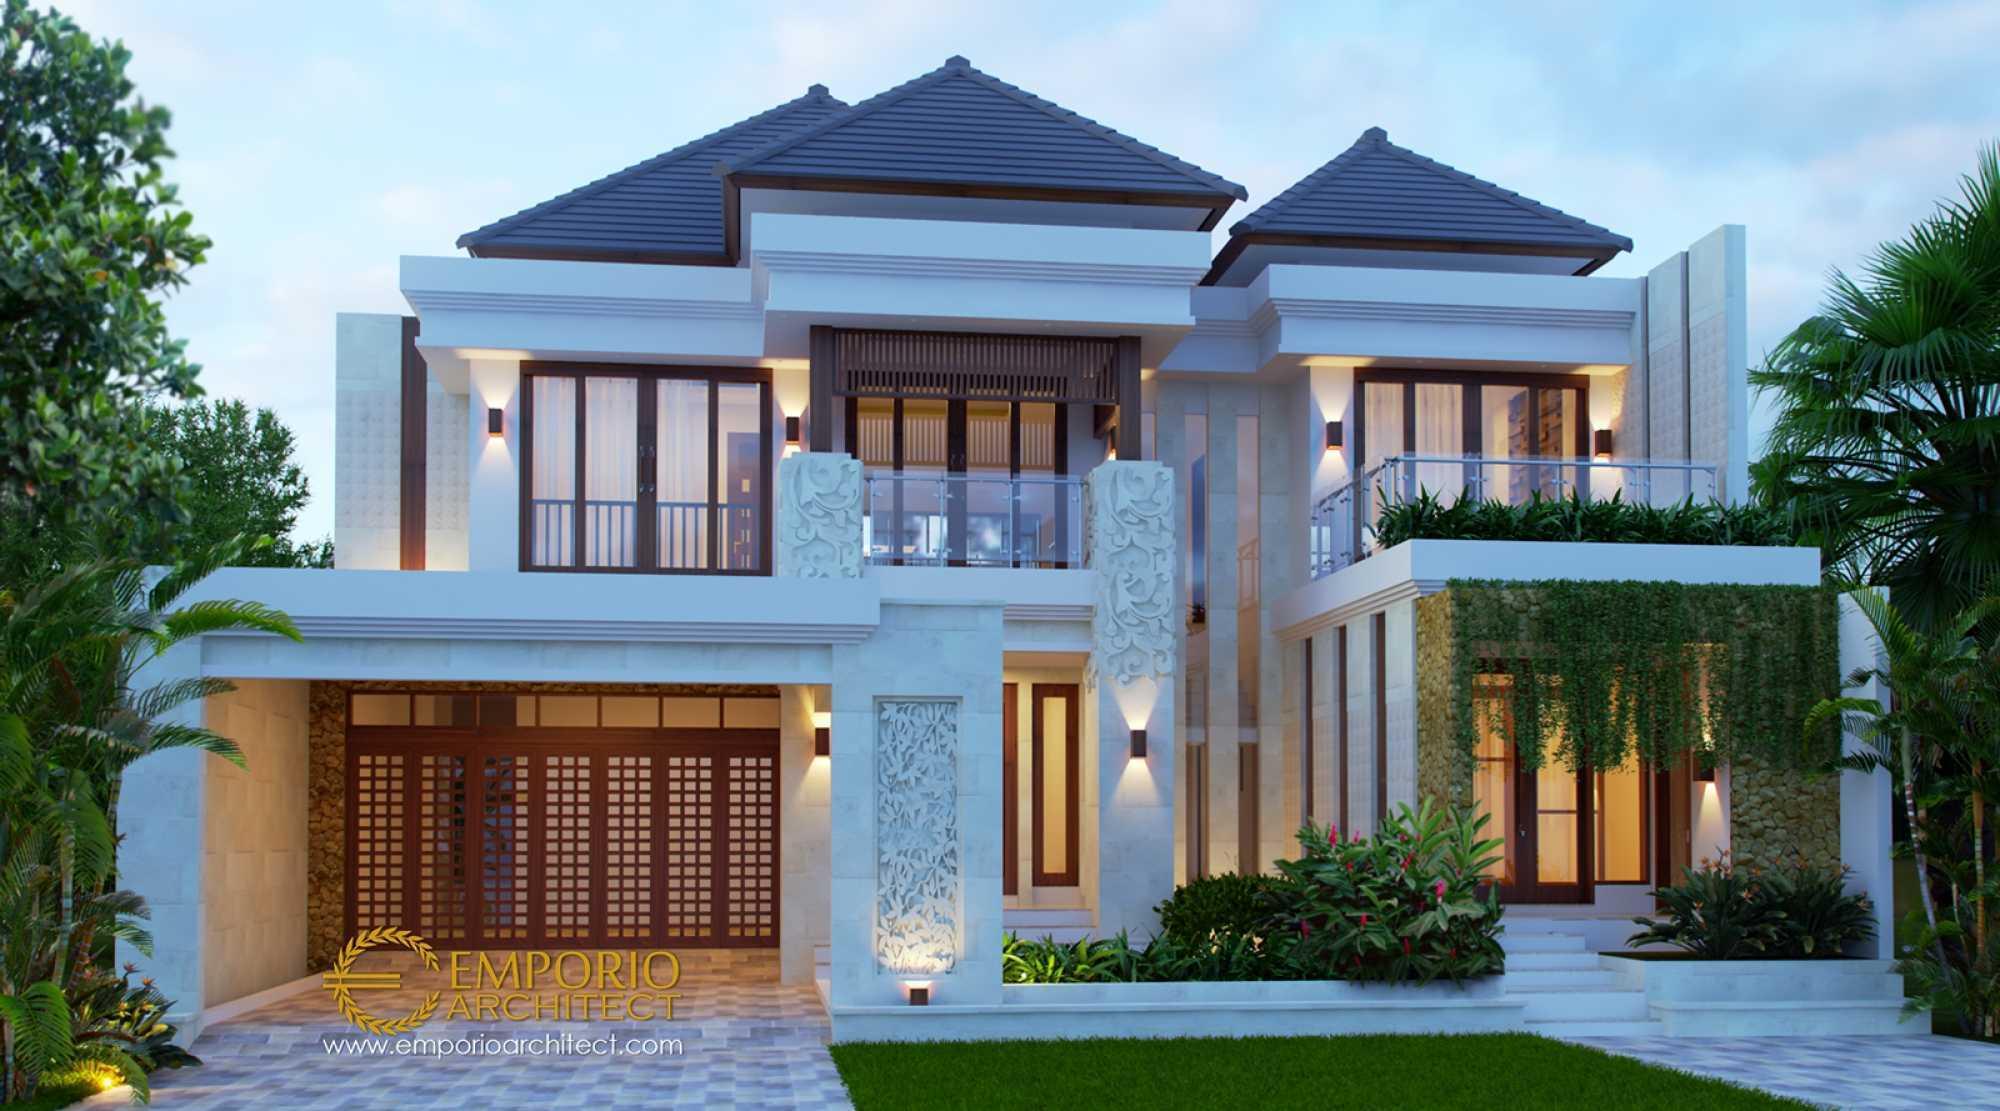 Emporio Architect Desain Rumah Villa Bali Tropis 409 @ Madiun, Jawa Timur Madiun, Kota Madiun, Jawa Timur, Indonesia Madiun, Kota Madiun, Jawa Timur, Indonesia Emporio-Architect-Desain-Rumah-Villa-Bali-Tropis-409-Madiun-Jawa-Timur Tropical  77296